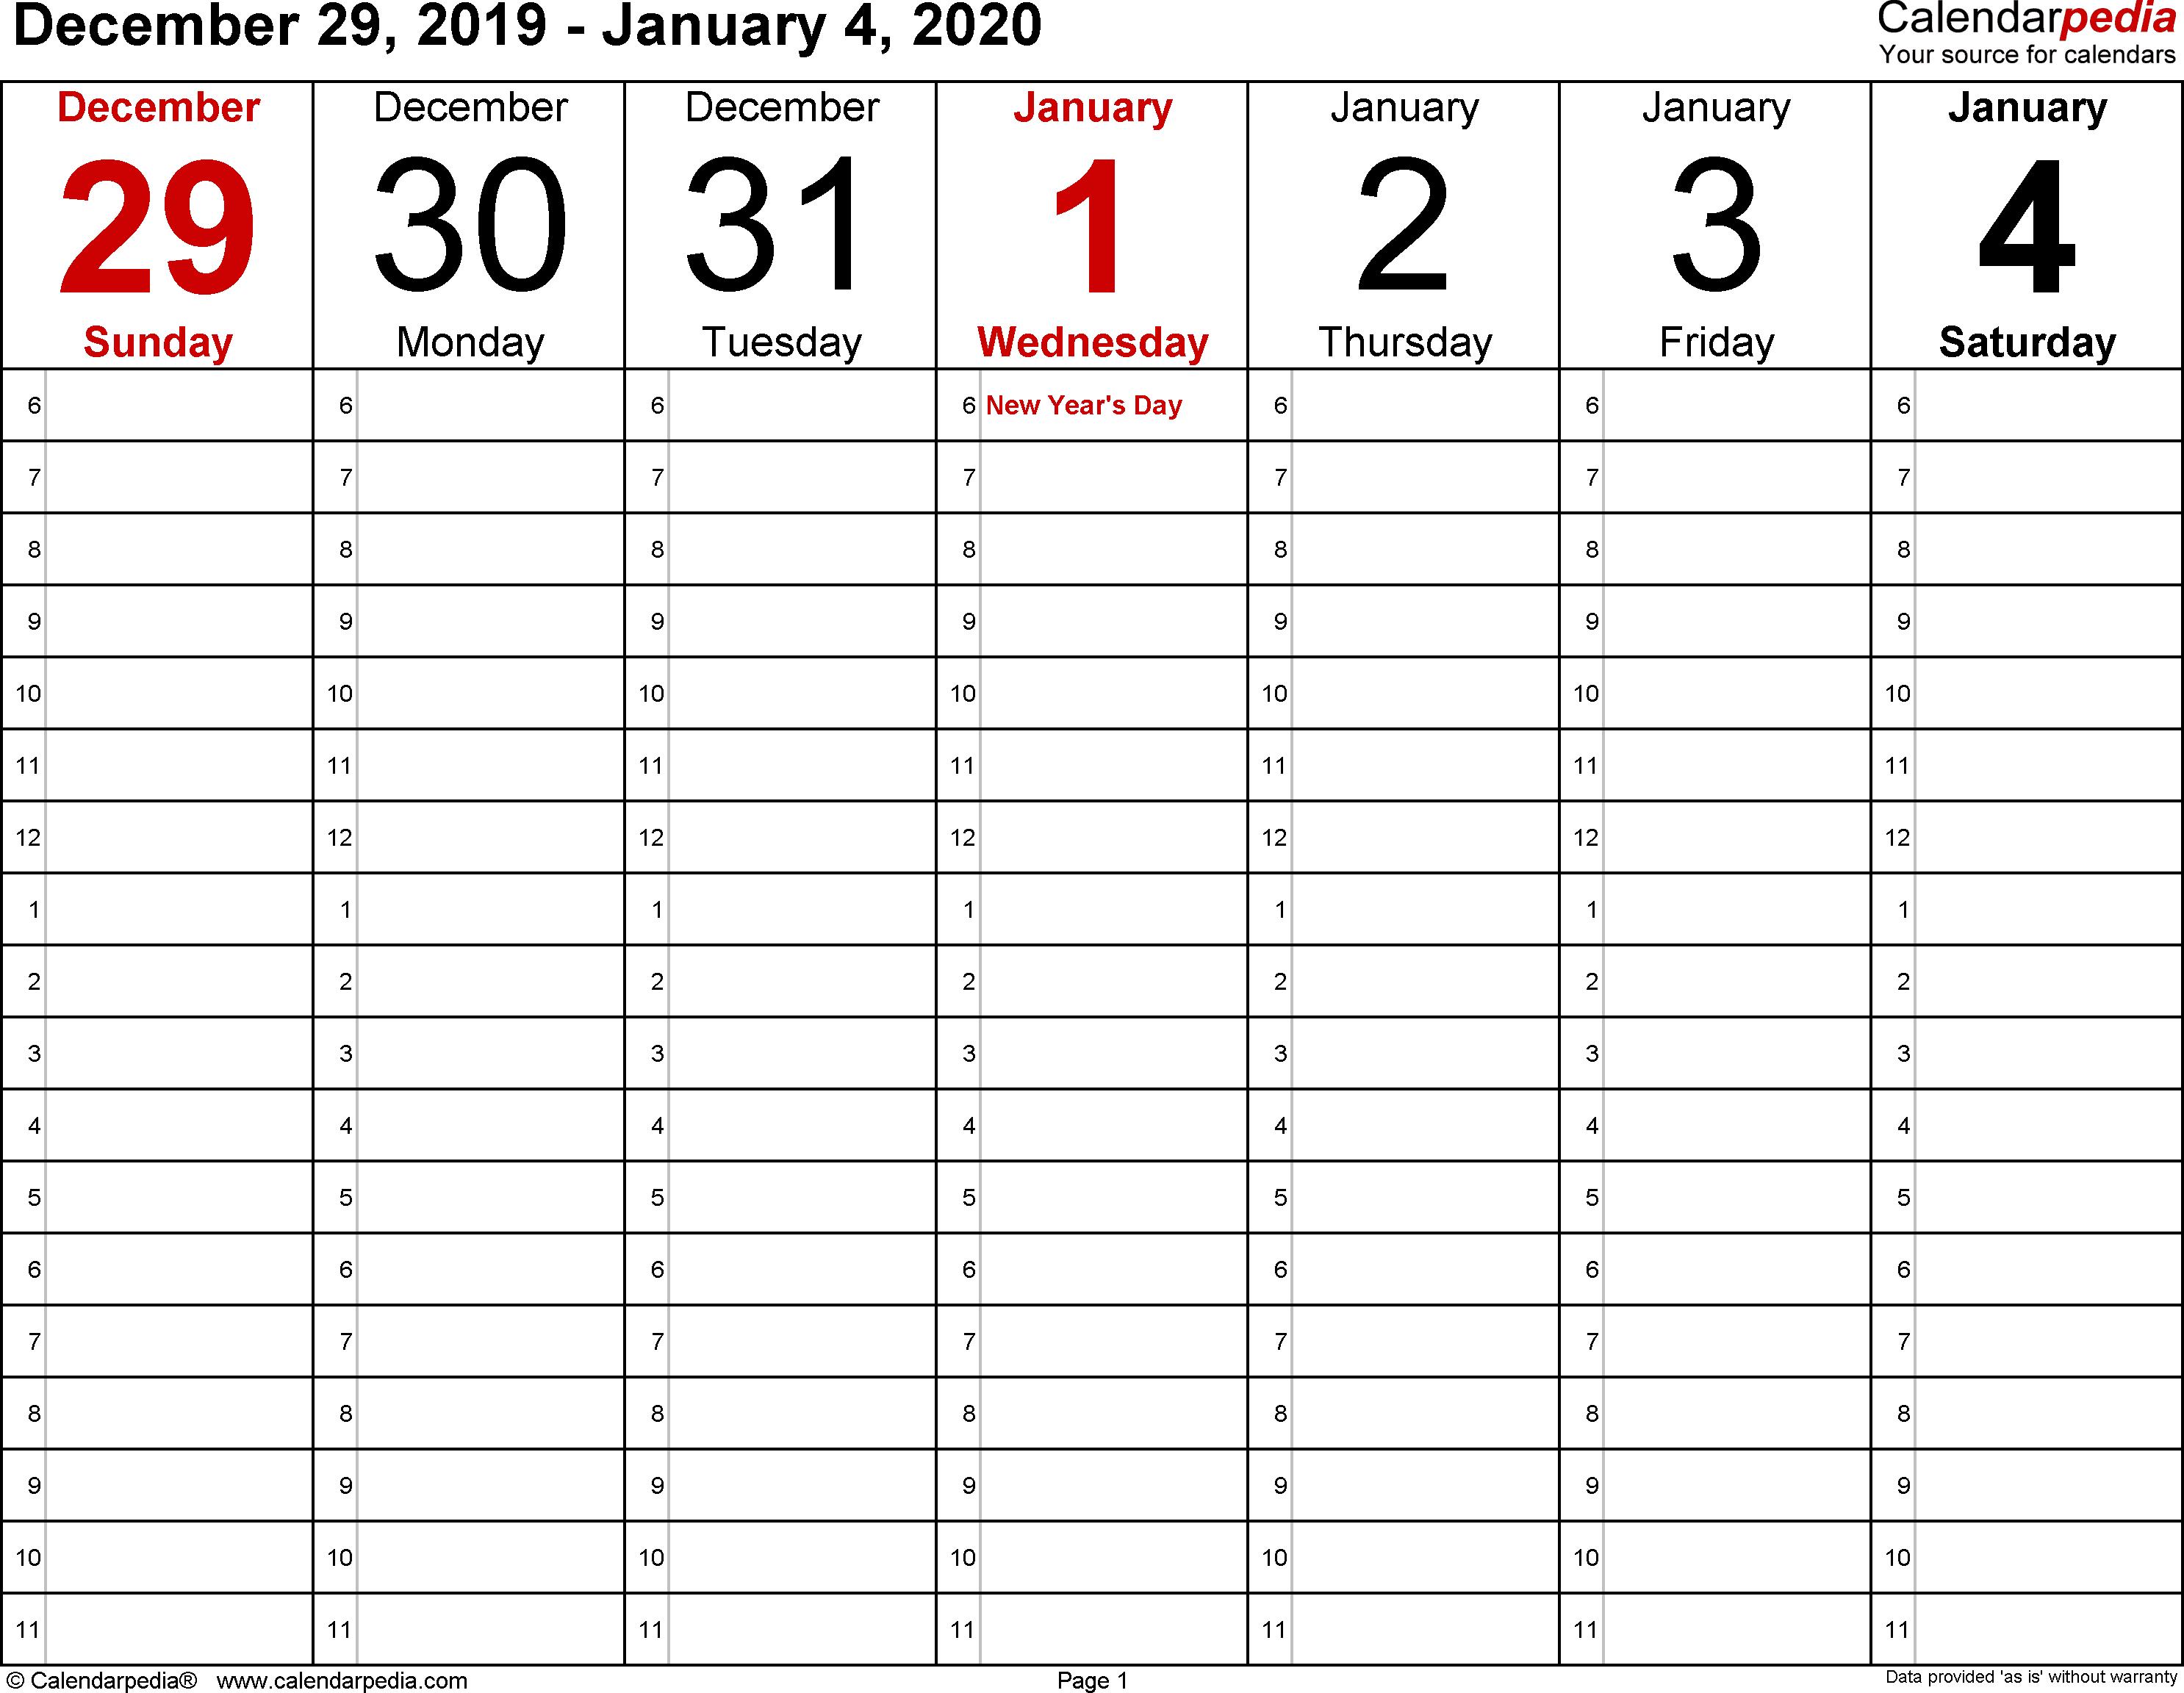 January 2020 Weekly Calendar